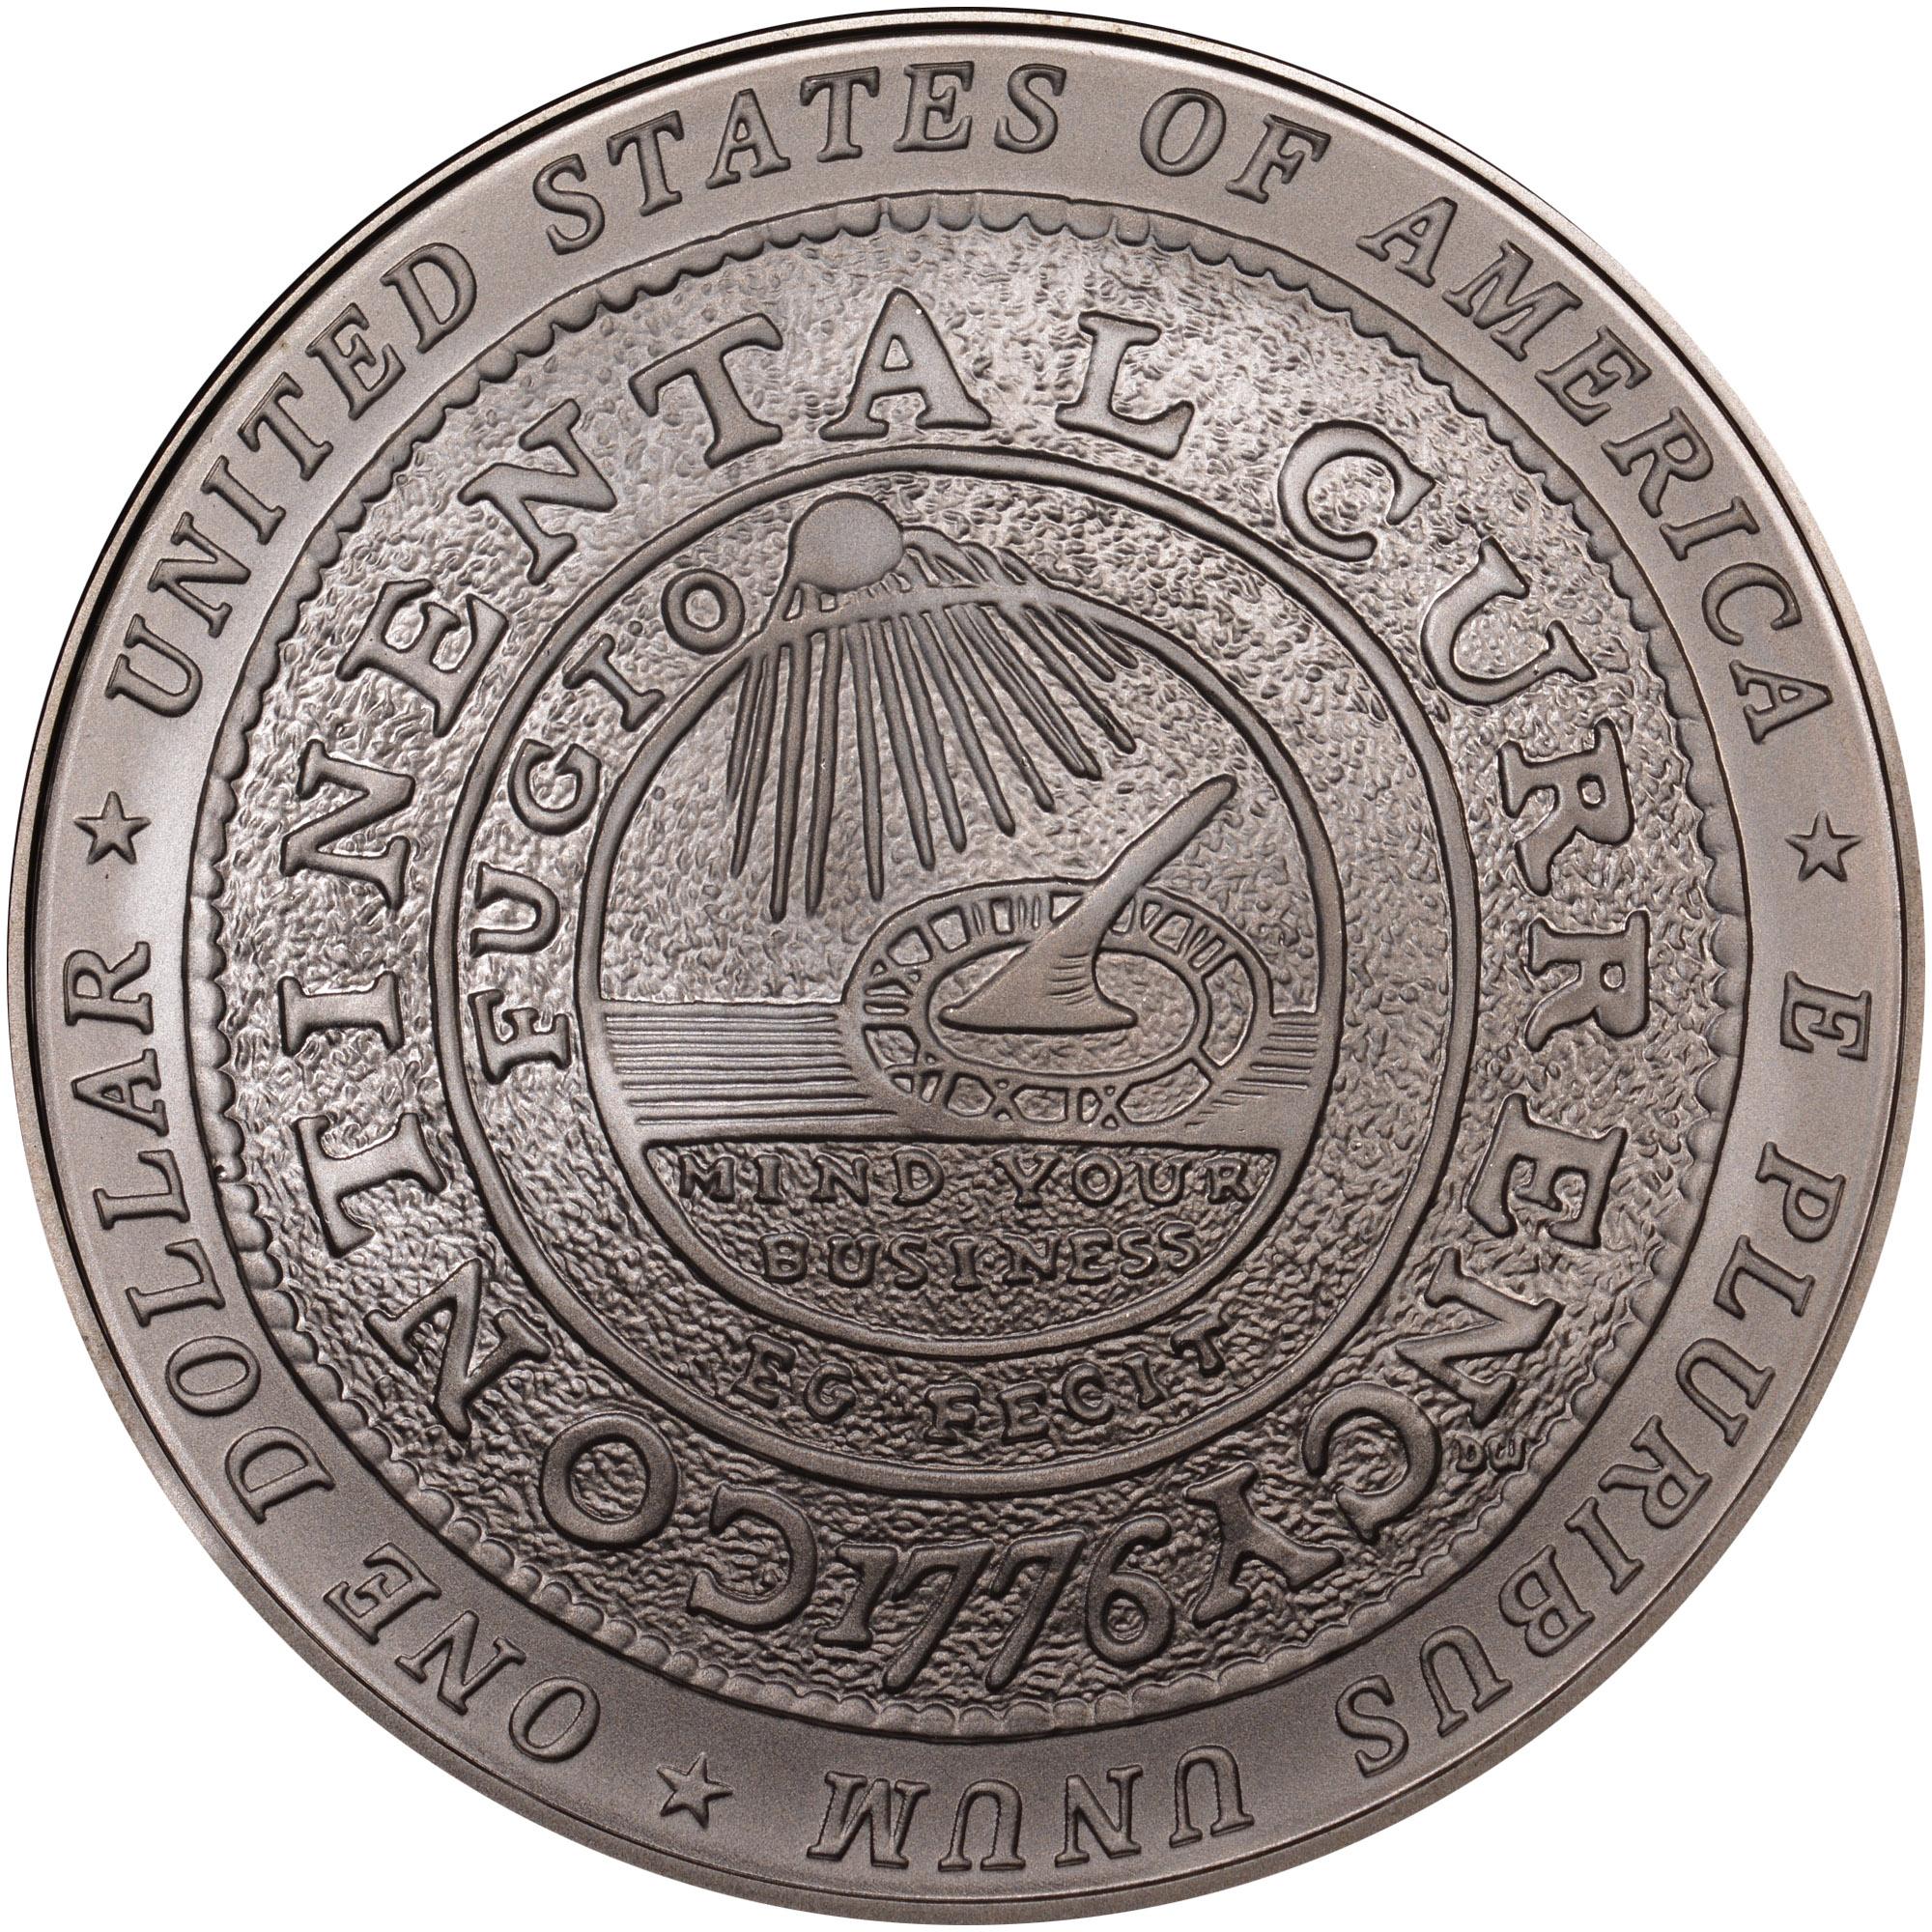 2006 Benjamin Franklin Scientist PROOF Silver Dollar Commemorative Coin ONLY $1